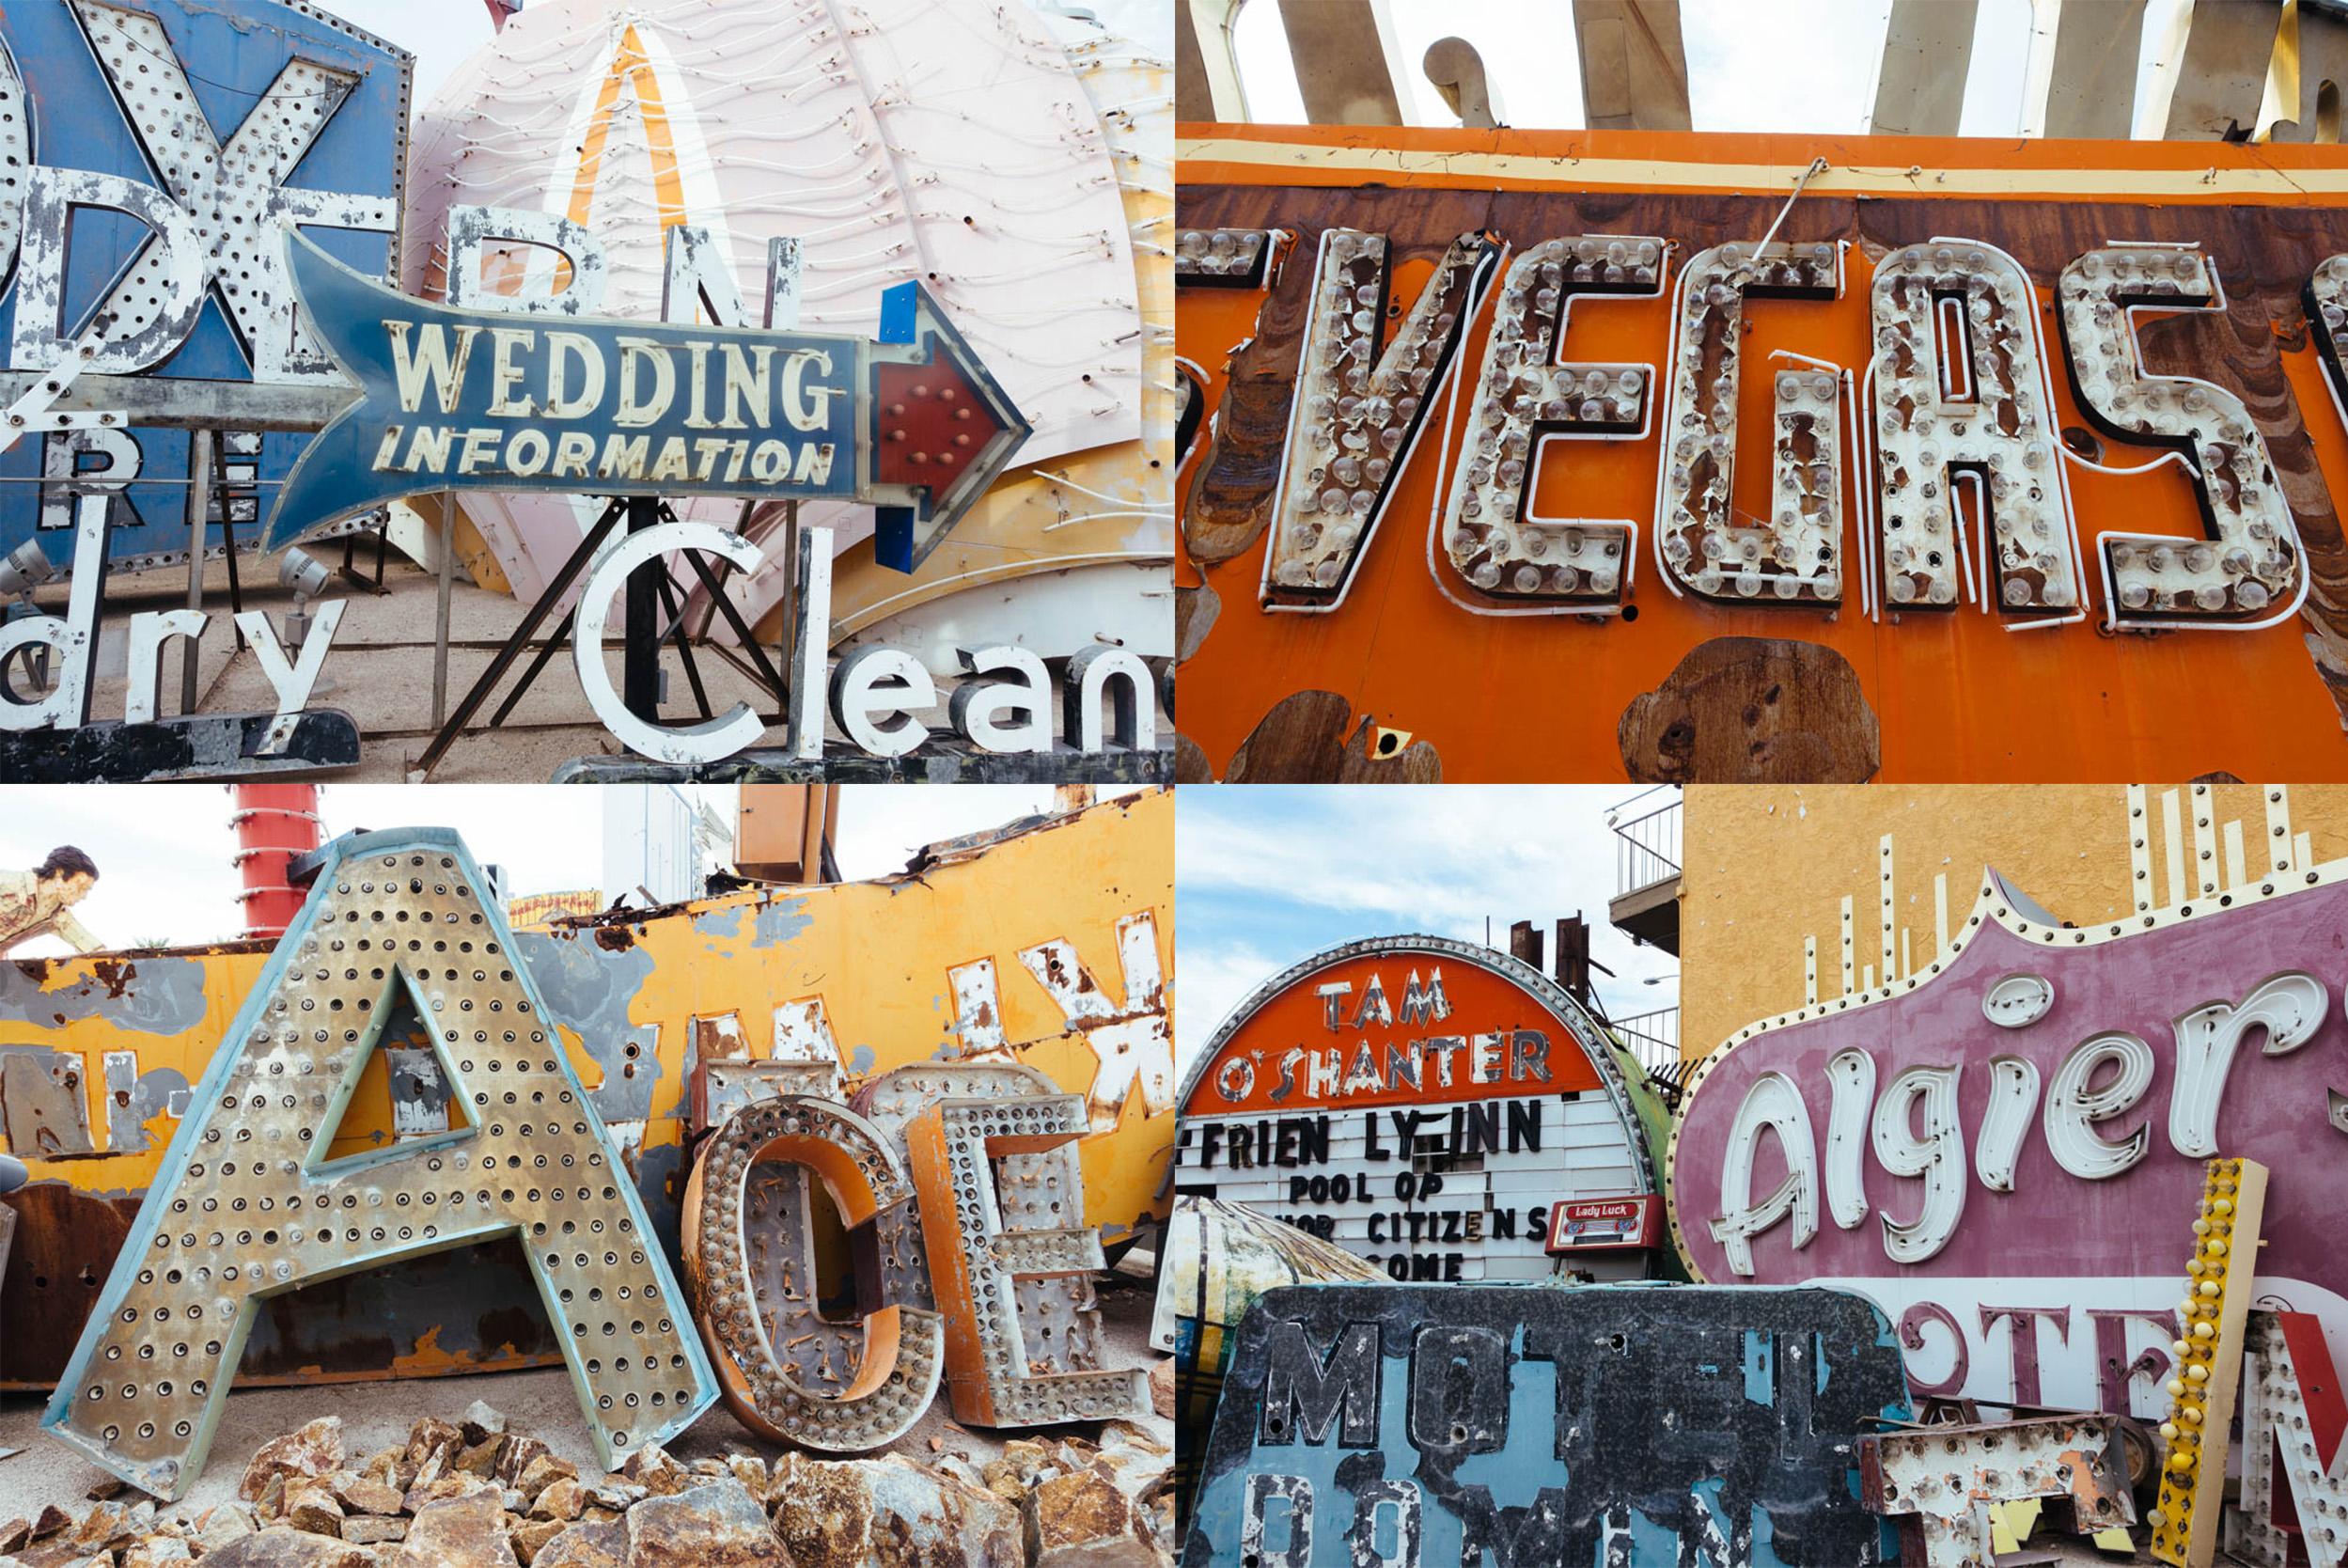 Neon Boneyard signs